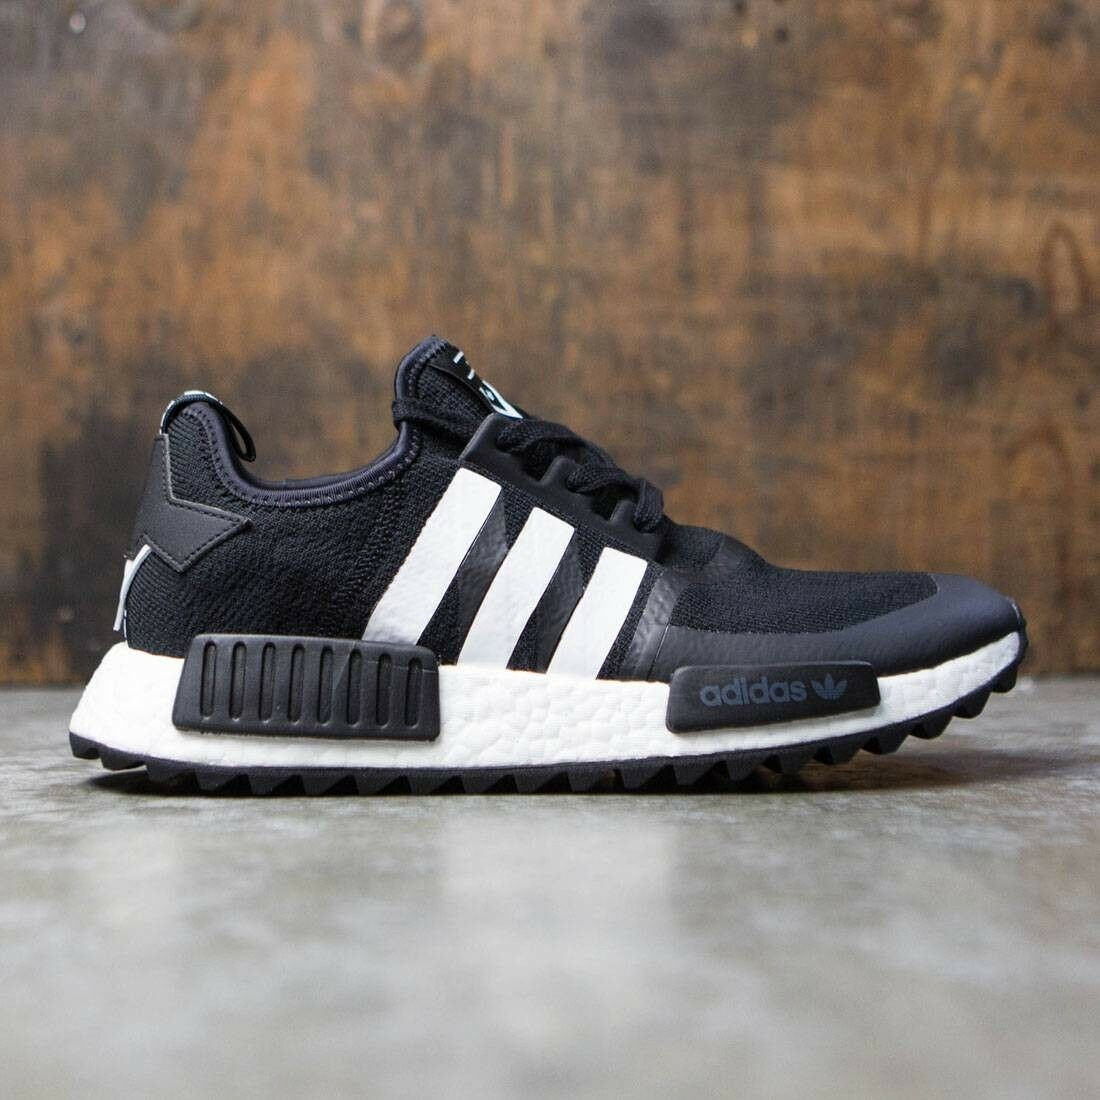 Adidas WM NMD Trail PK Black White Size 12. ba7518 yeezy ultra boost